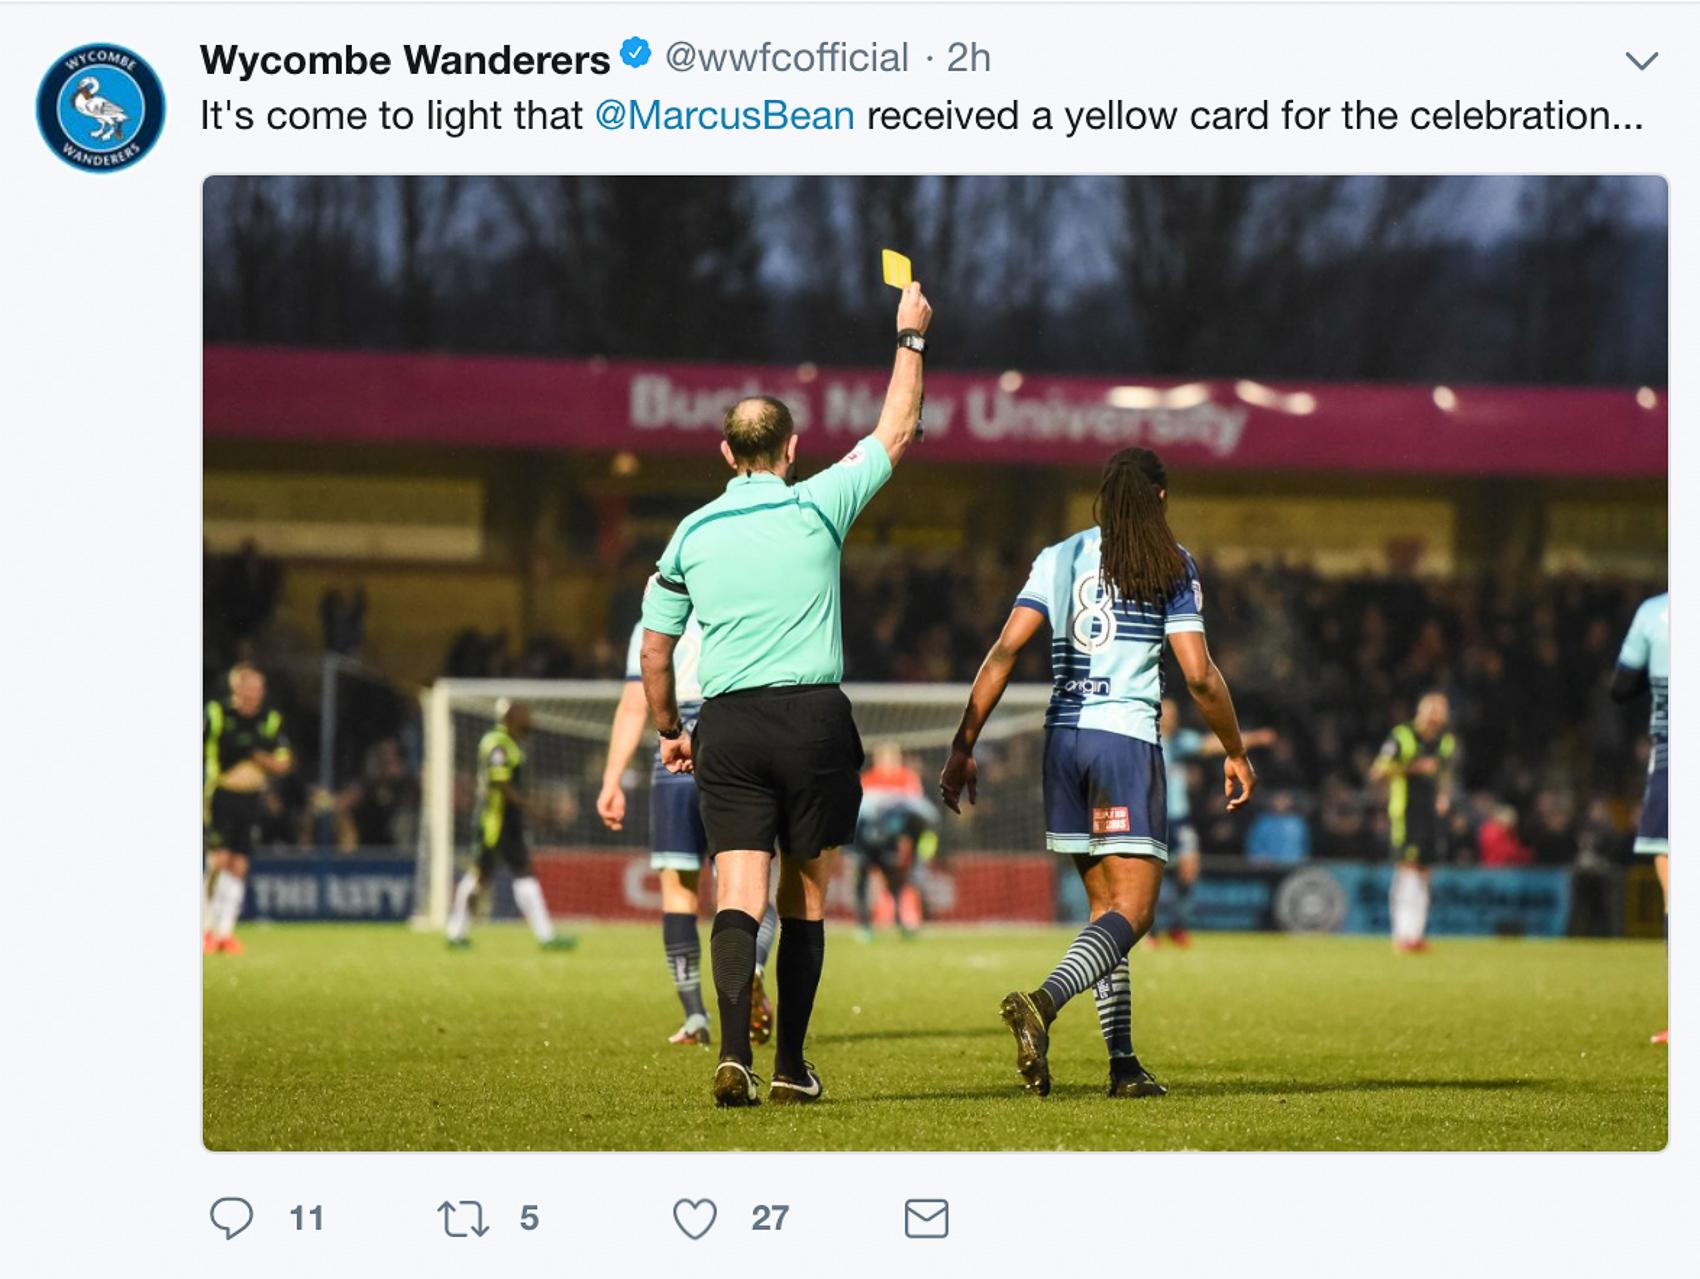 stephen-wright-photography-tearsheet-wycombe-wanderers-carlisle-united-2.jpg